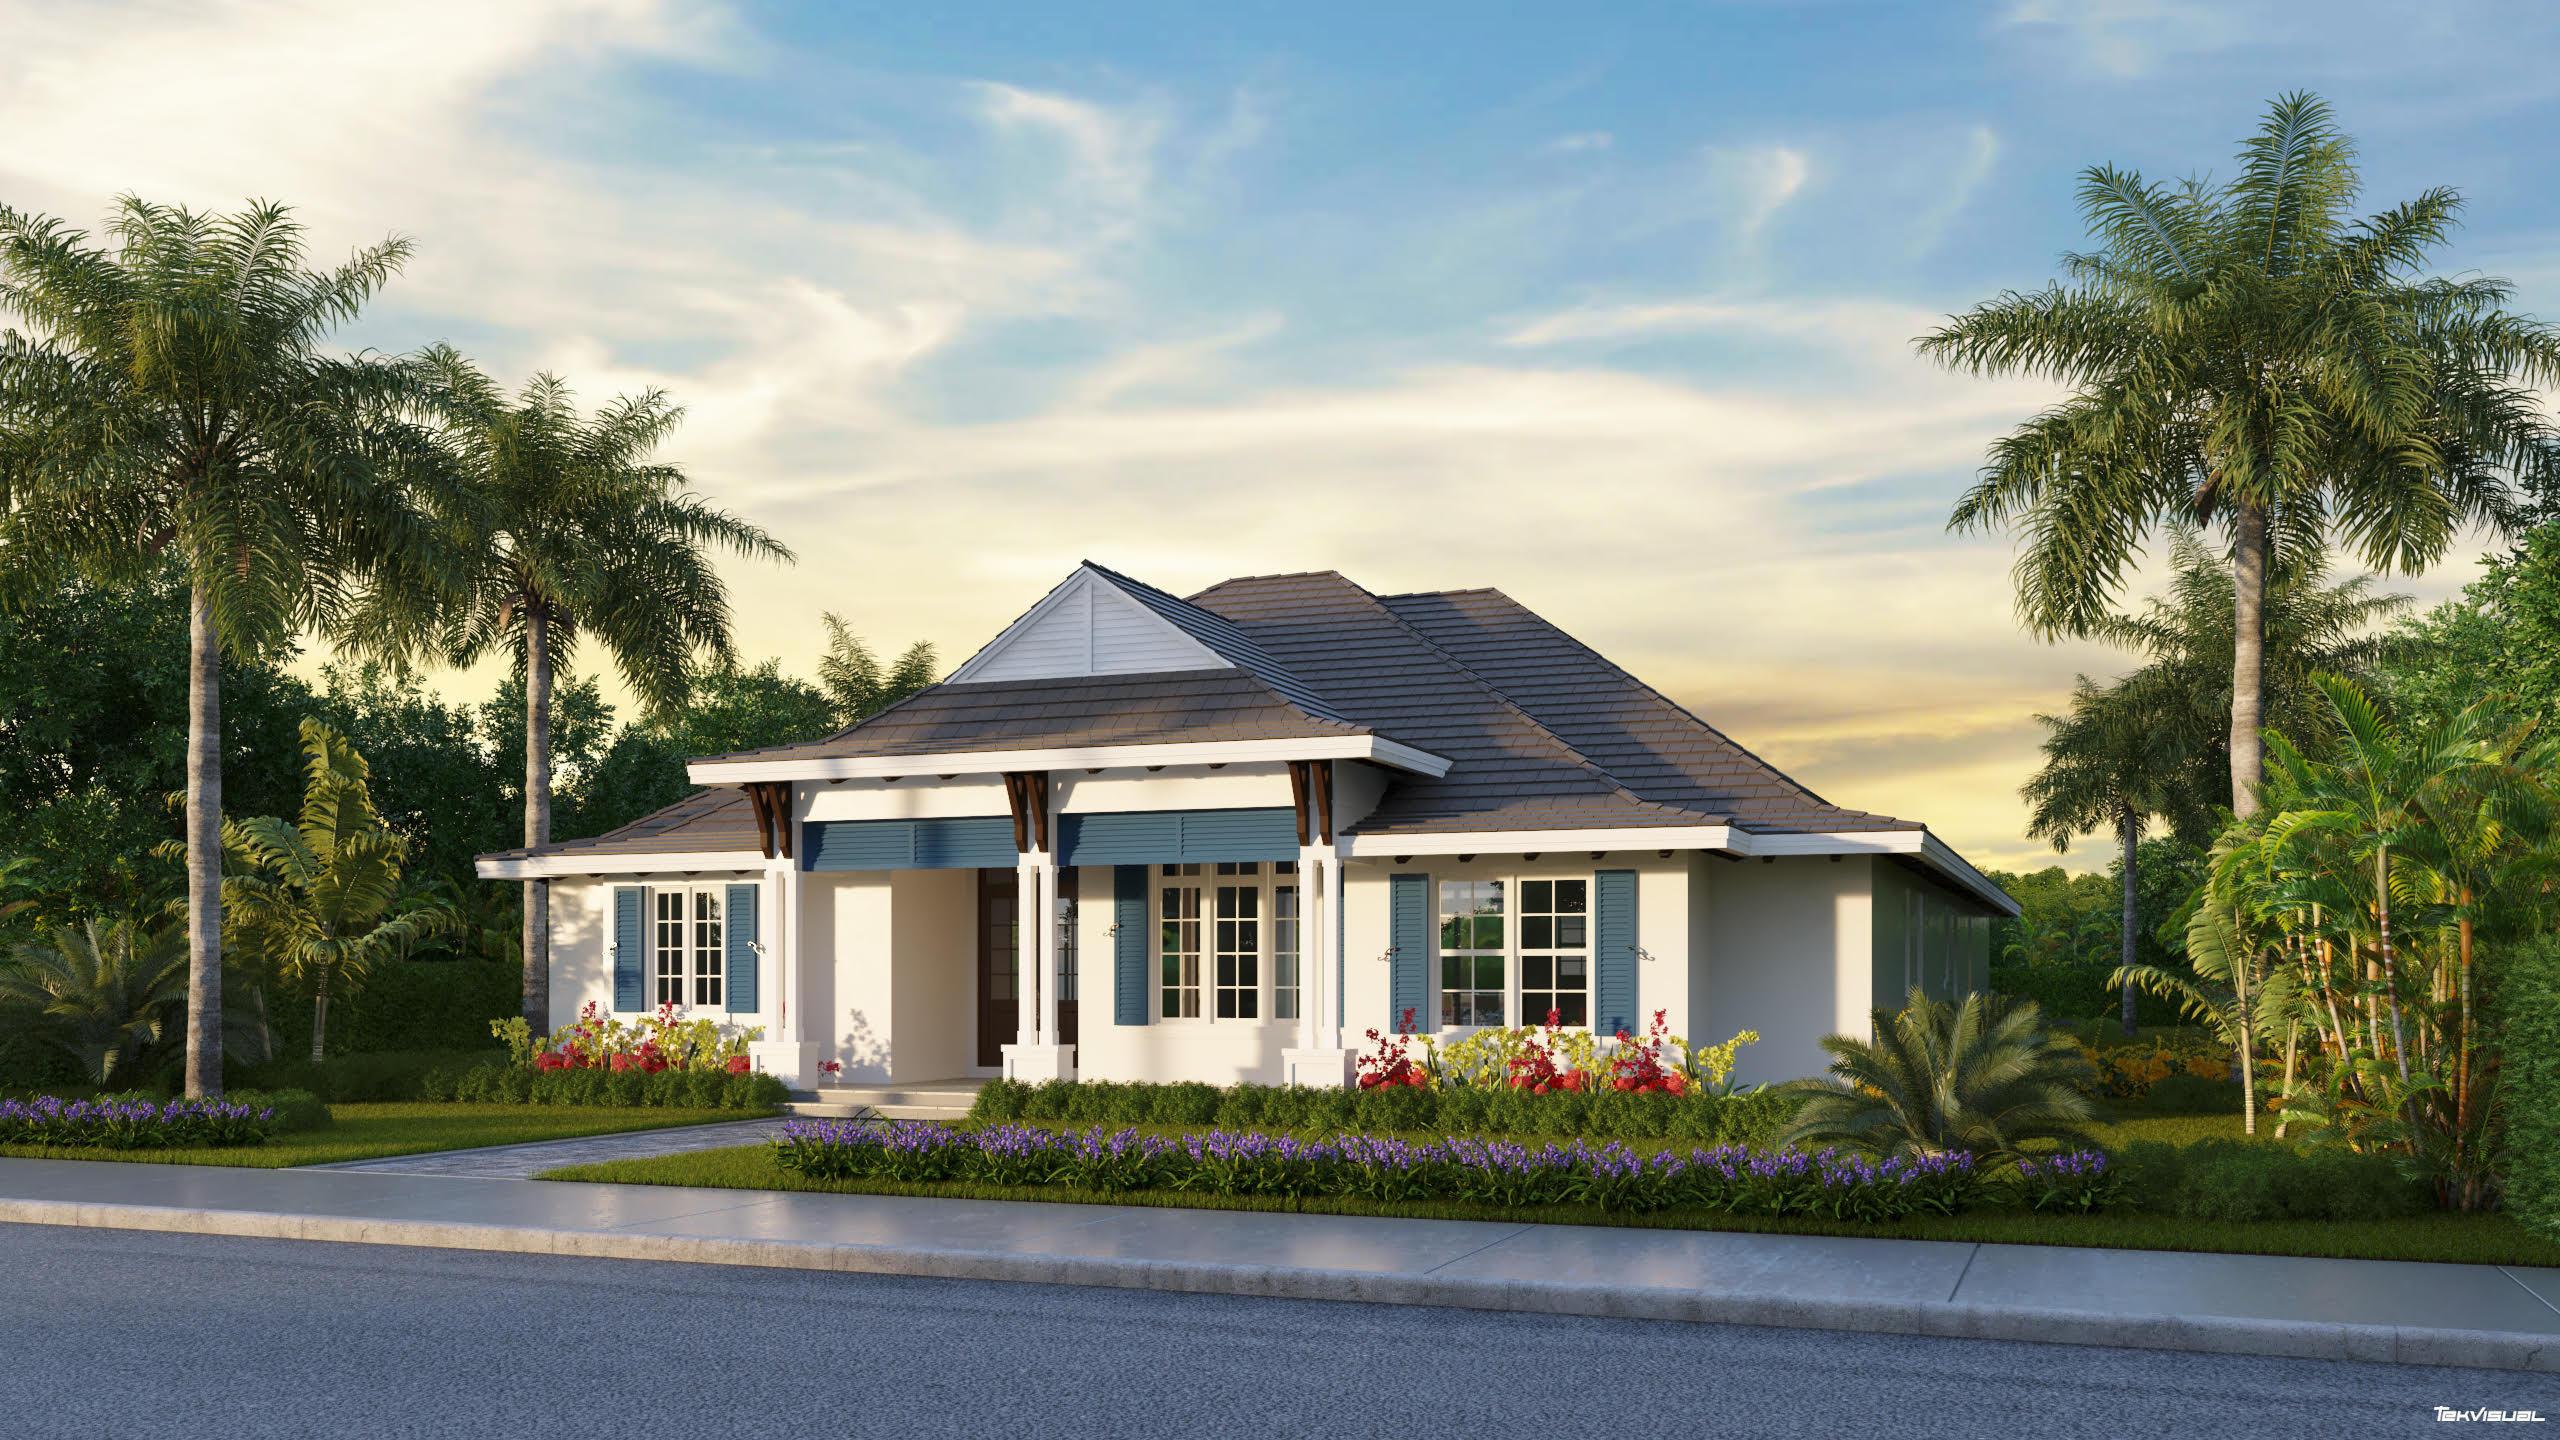 2632 Greenway Drive Lot #351  - Abacoa Homes - photo 1